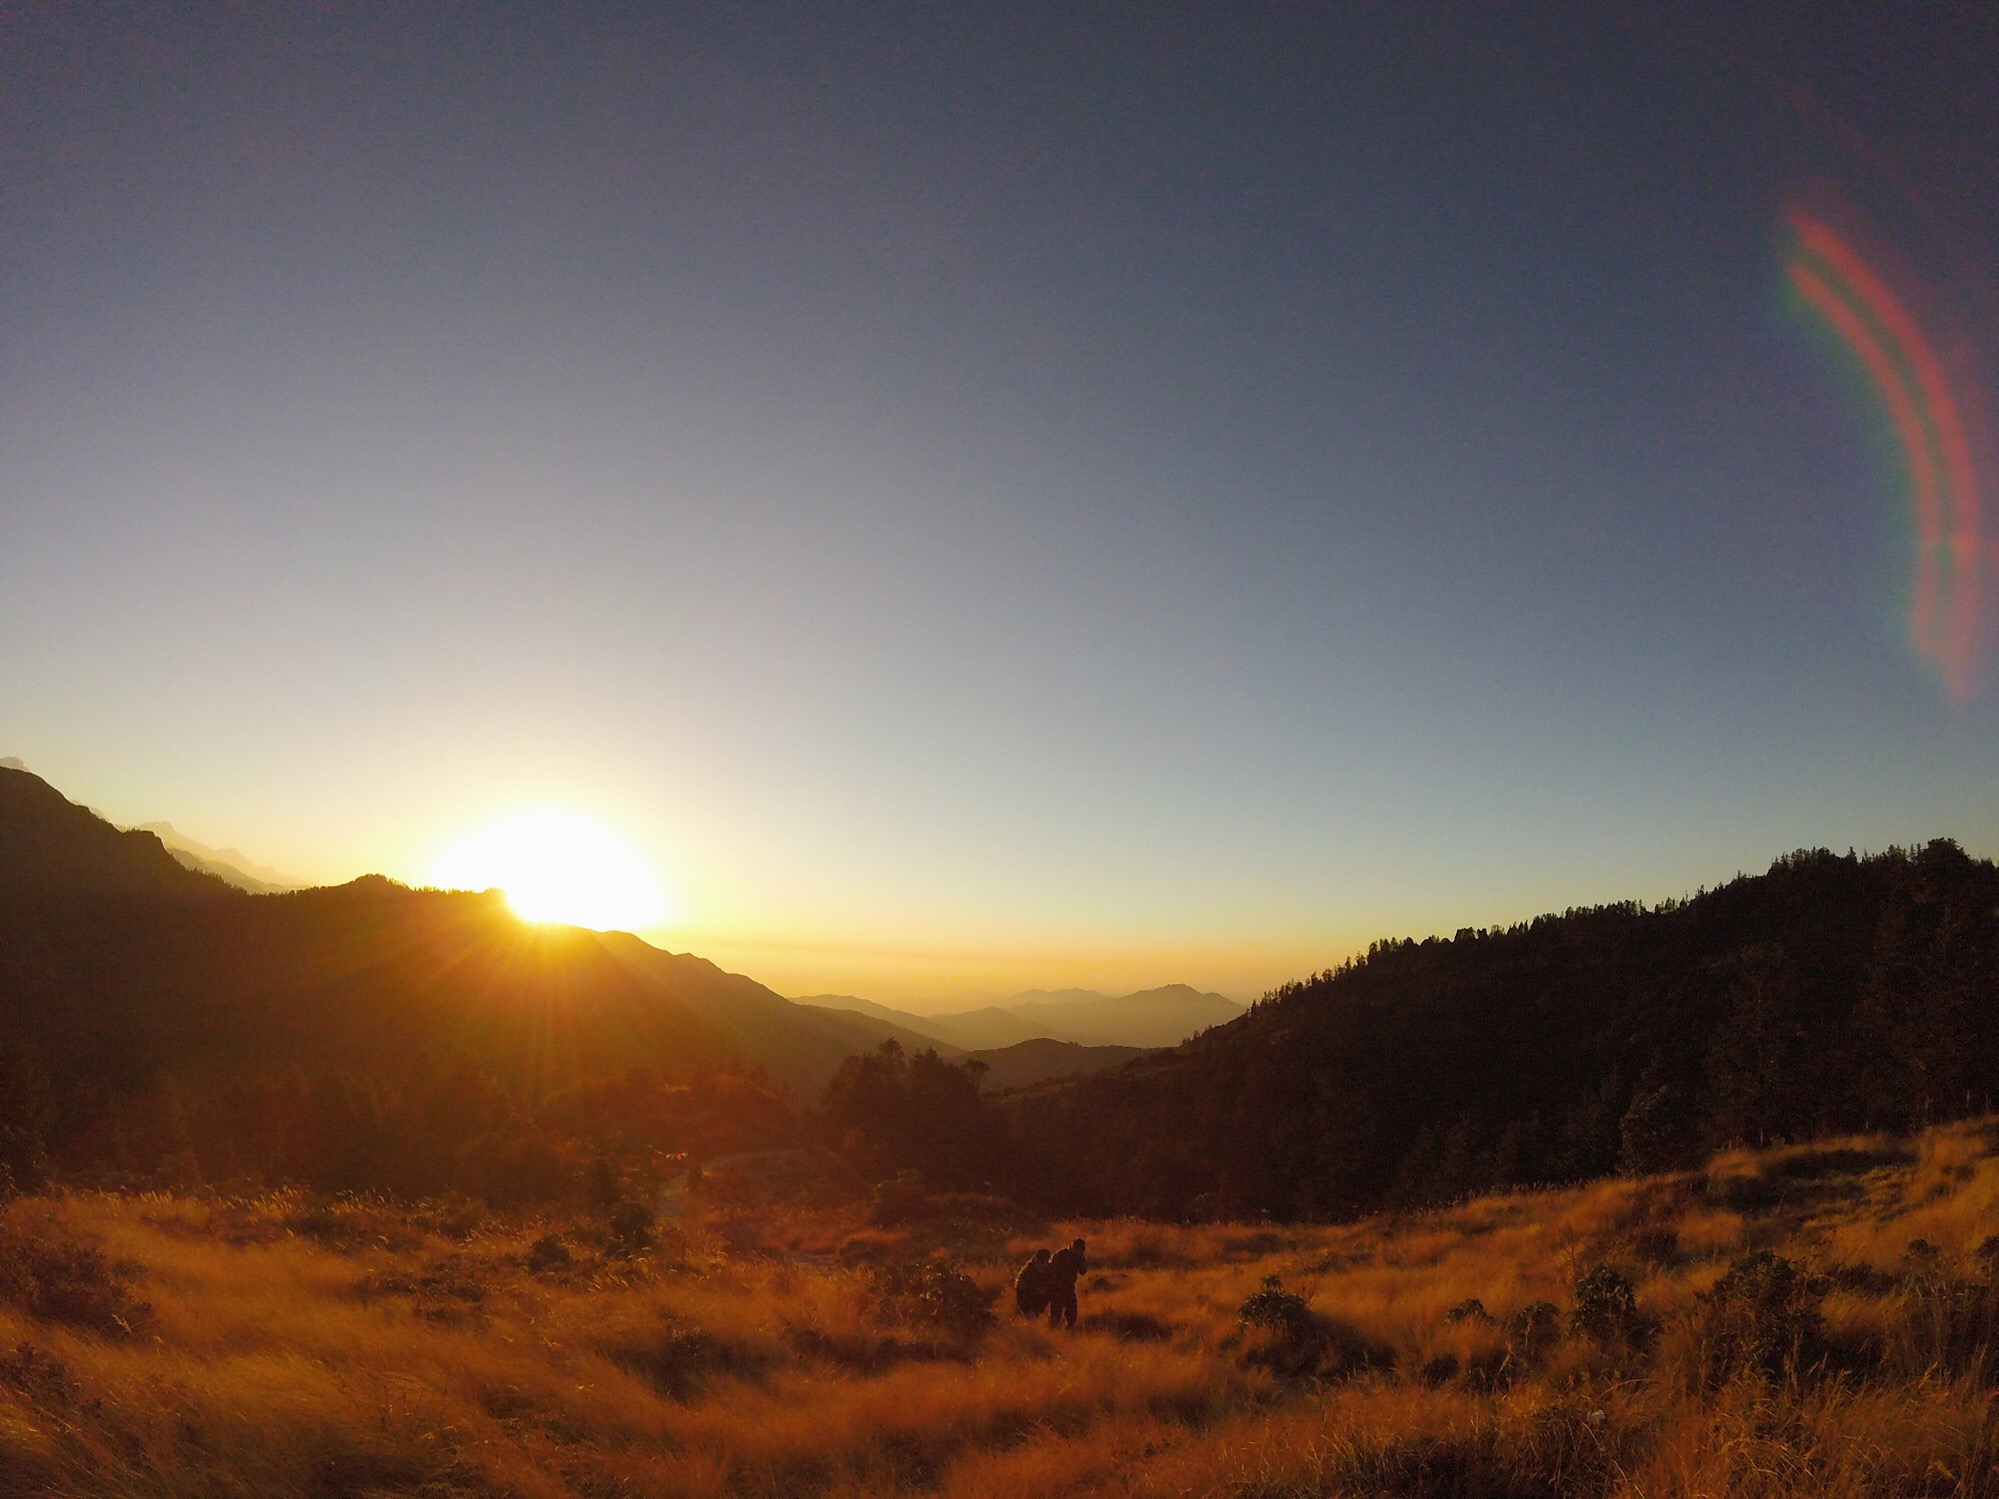 Nov 9.2, 2016   Sun breaks over the eastern edge of the Annapurna Massif lighting the high grasslands to a golden blaze. Pilgrims forge towards the hilltop in short, broken steps over broken shale.